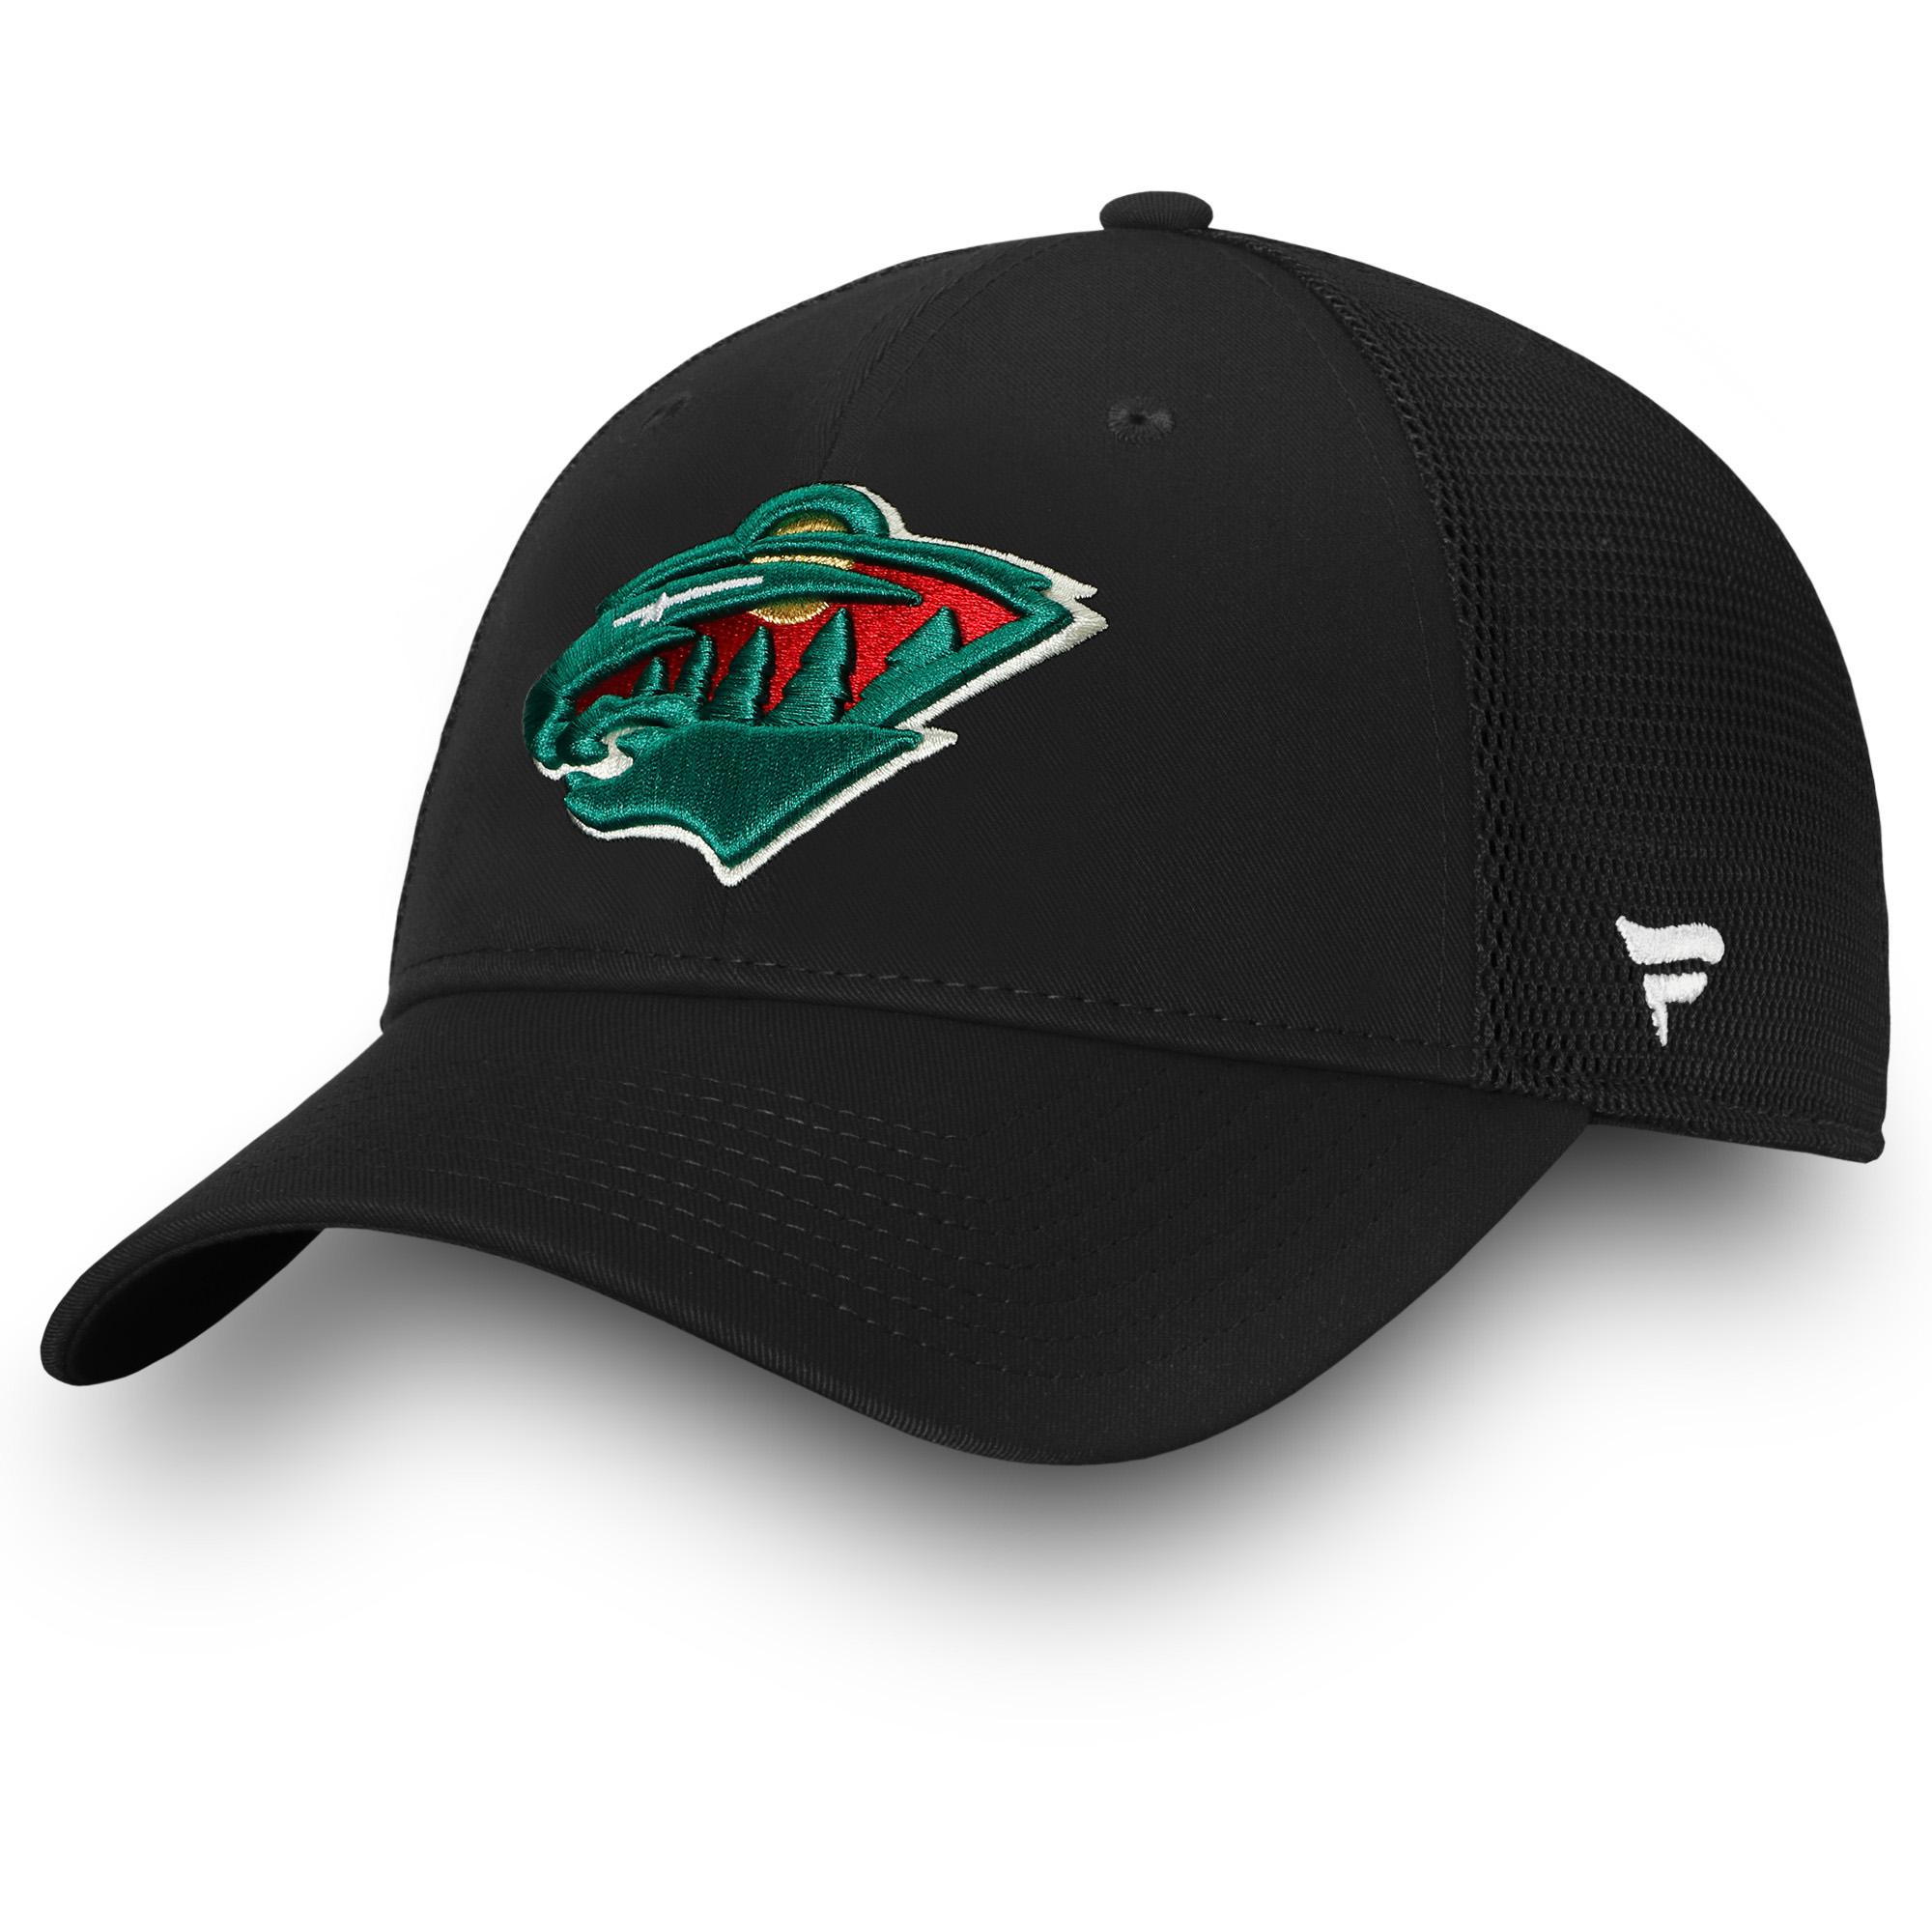 Minnesota Wild Fanatics Branded Elevated Core Trucker Adjustable Snapback Hat - Black - OSFA